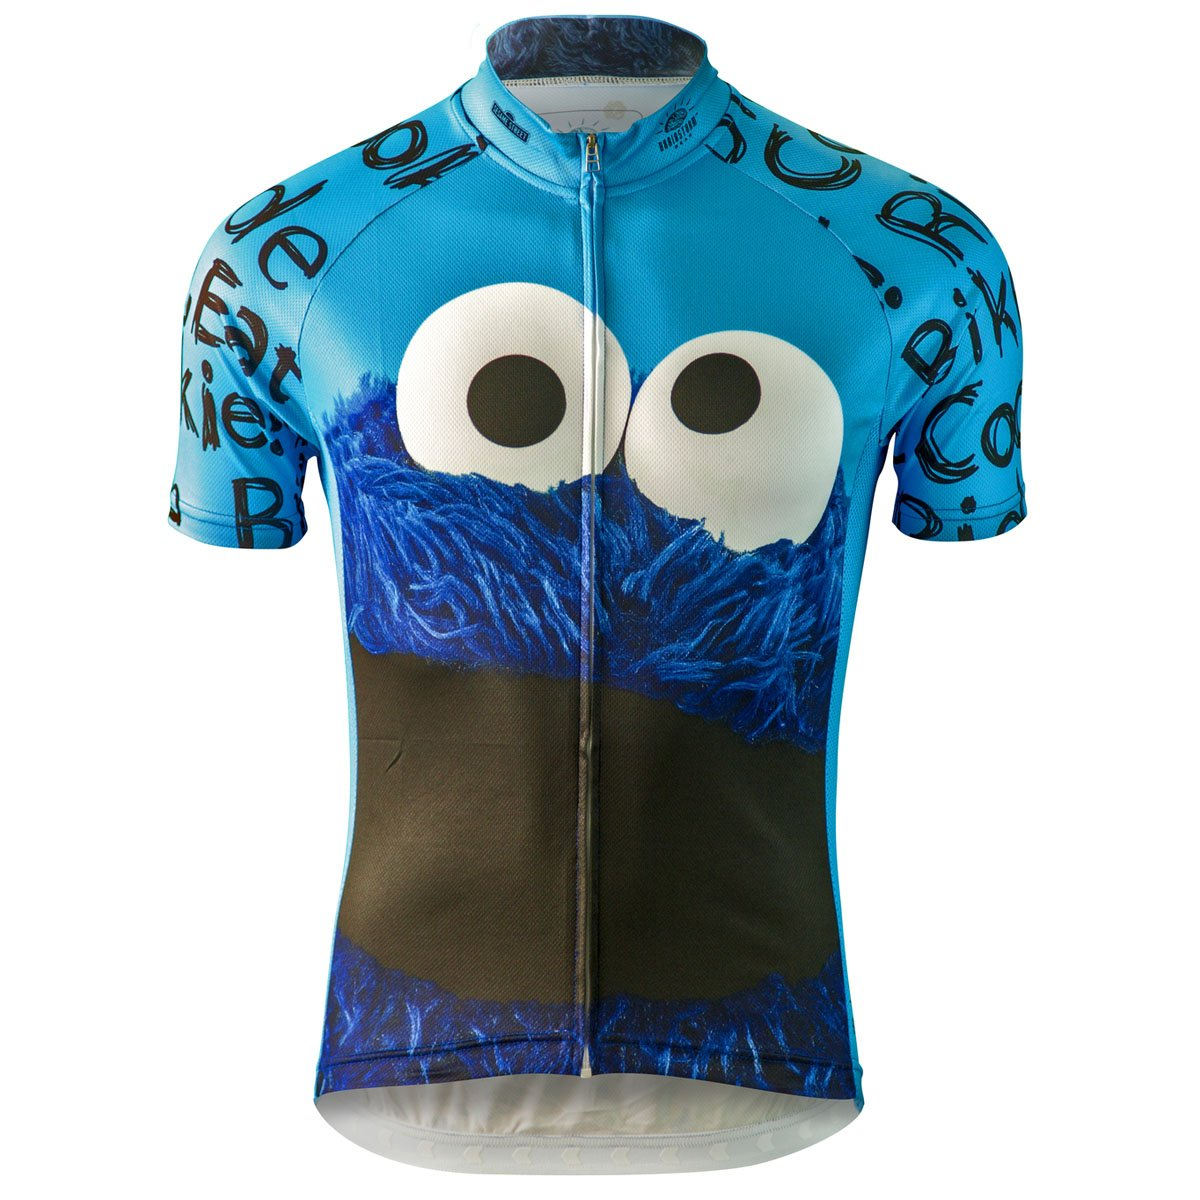 561882e8f Amazon.com   Brainstorm Gear 2015 Men s Oscar the Grouch Cycling ...